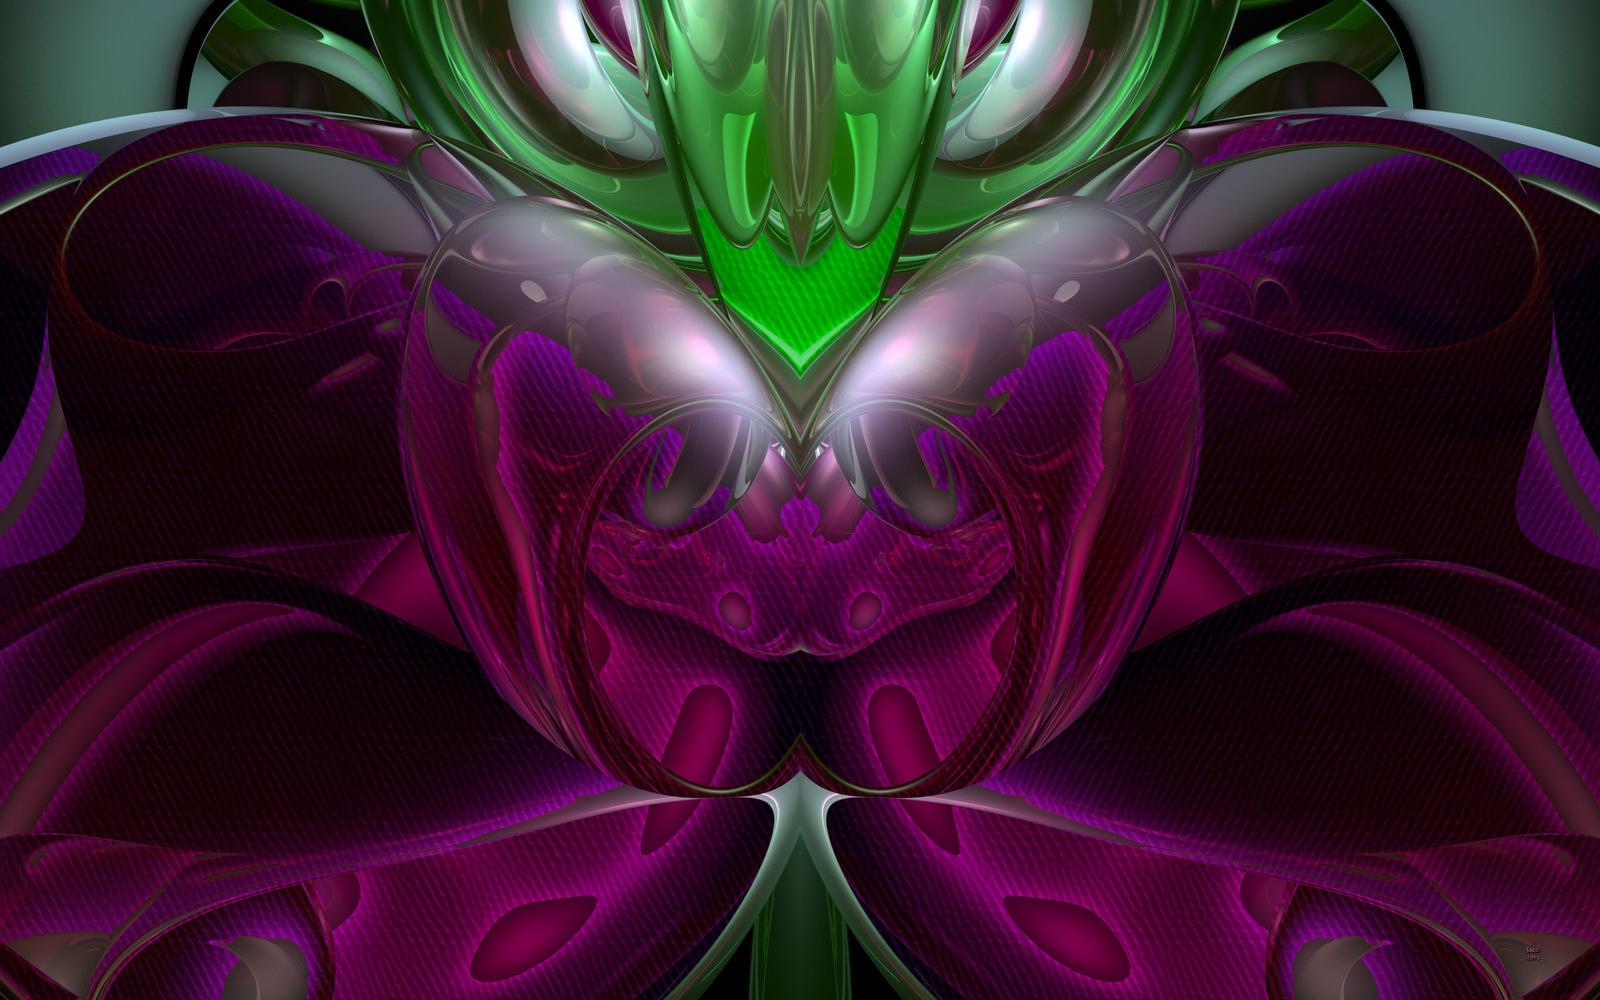 Butterfly Effect by jazzilady